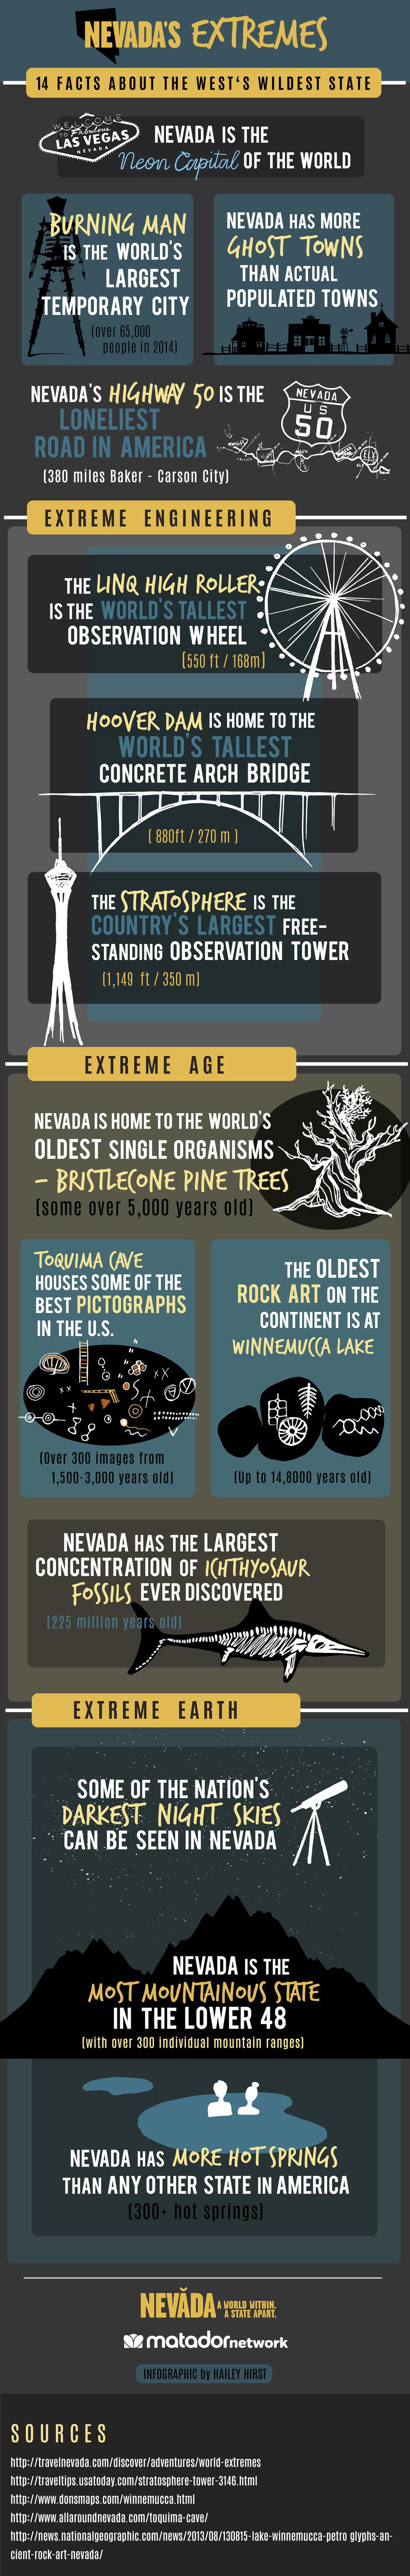 Nevada's Extremes -   Matador Network & Travel Nevada